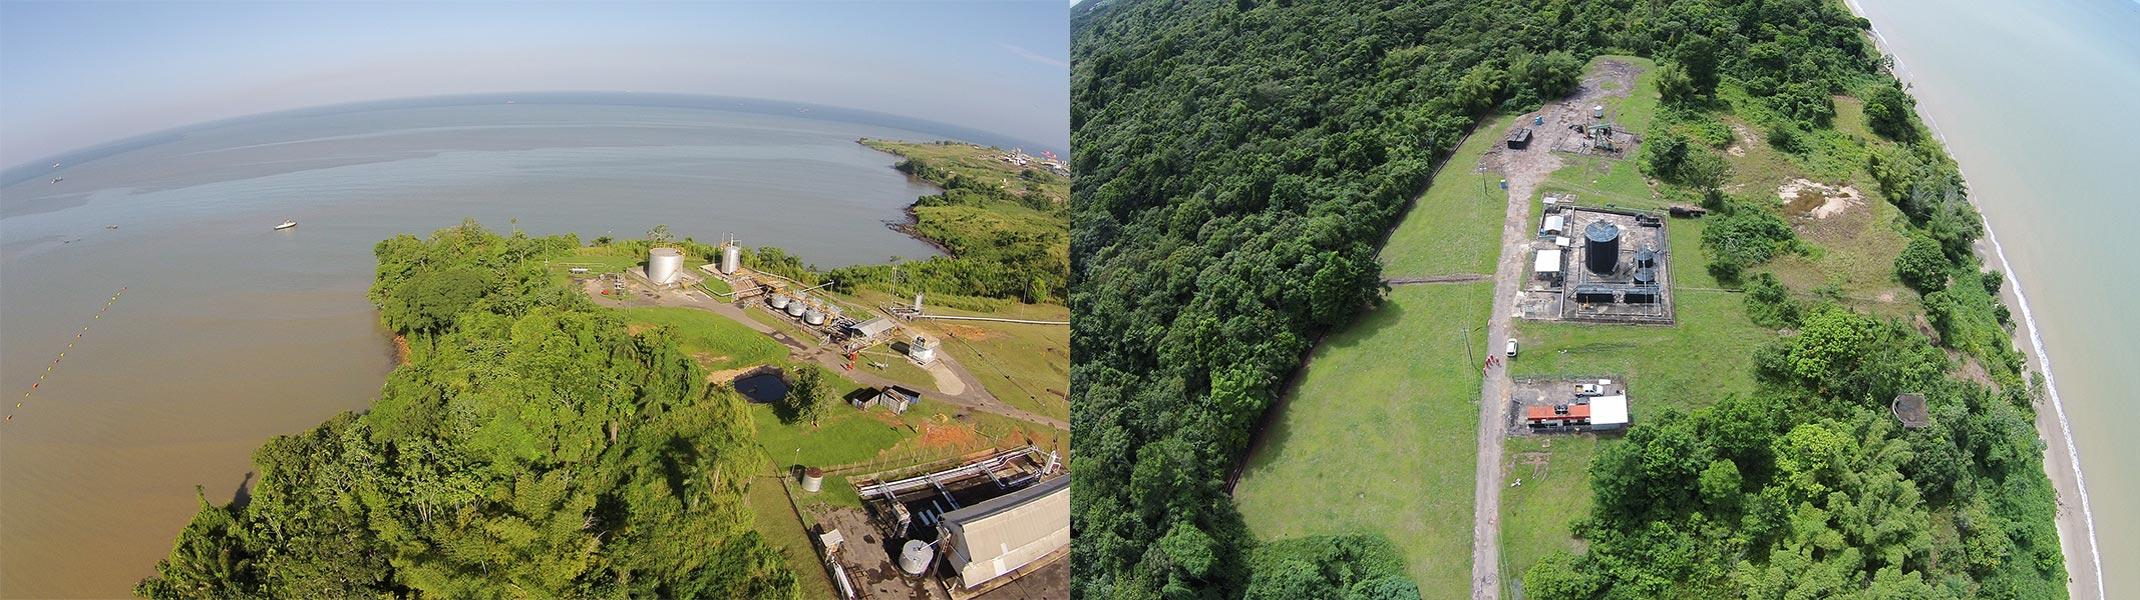 Established Facilities: Aerial of Brighton and Pt. Ligoure Land Facilities